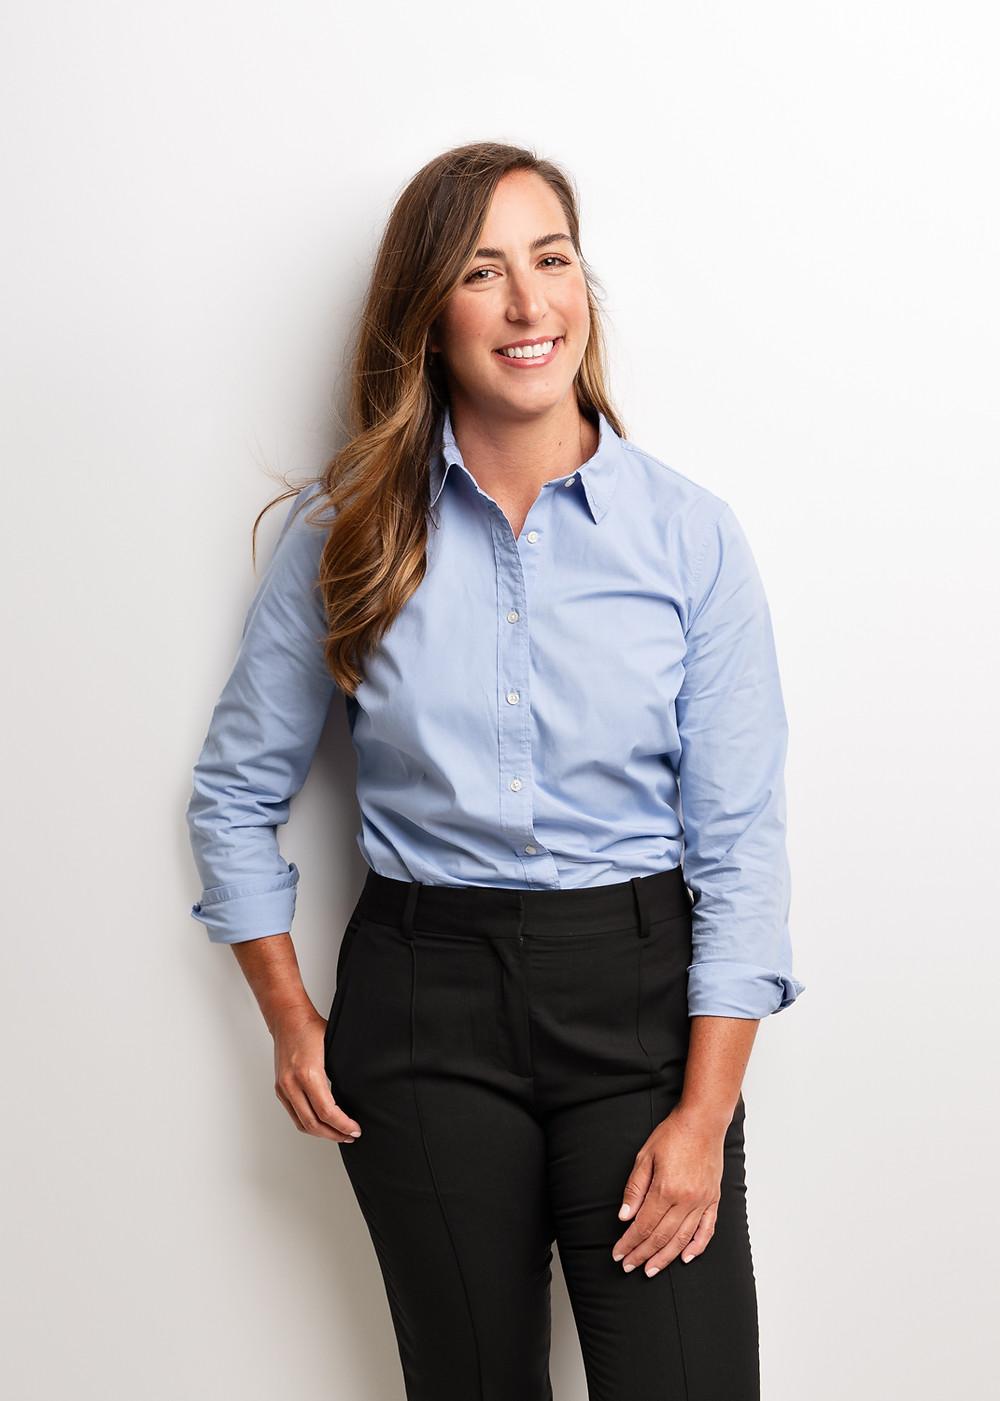 studio headshots business woman southern pines  lifestyle white background pinehurst